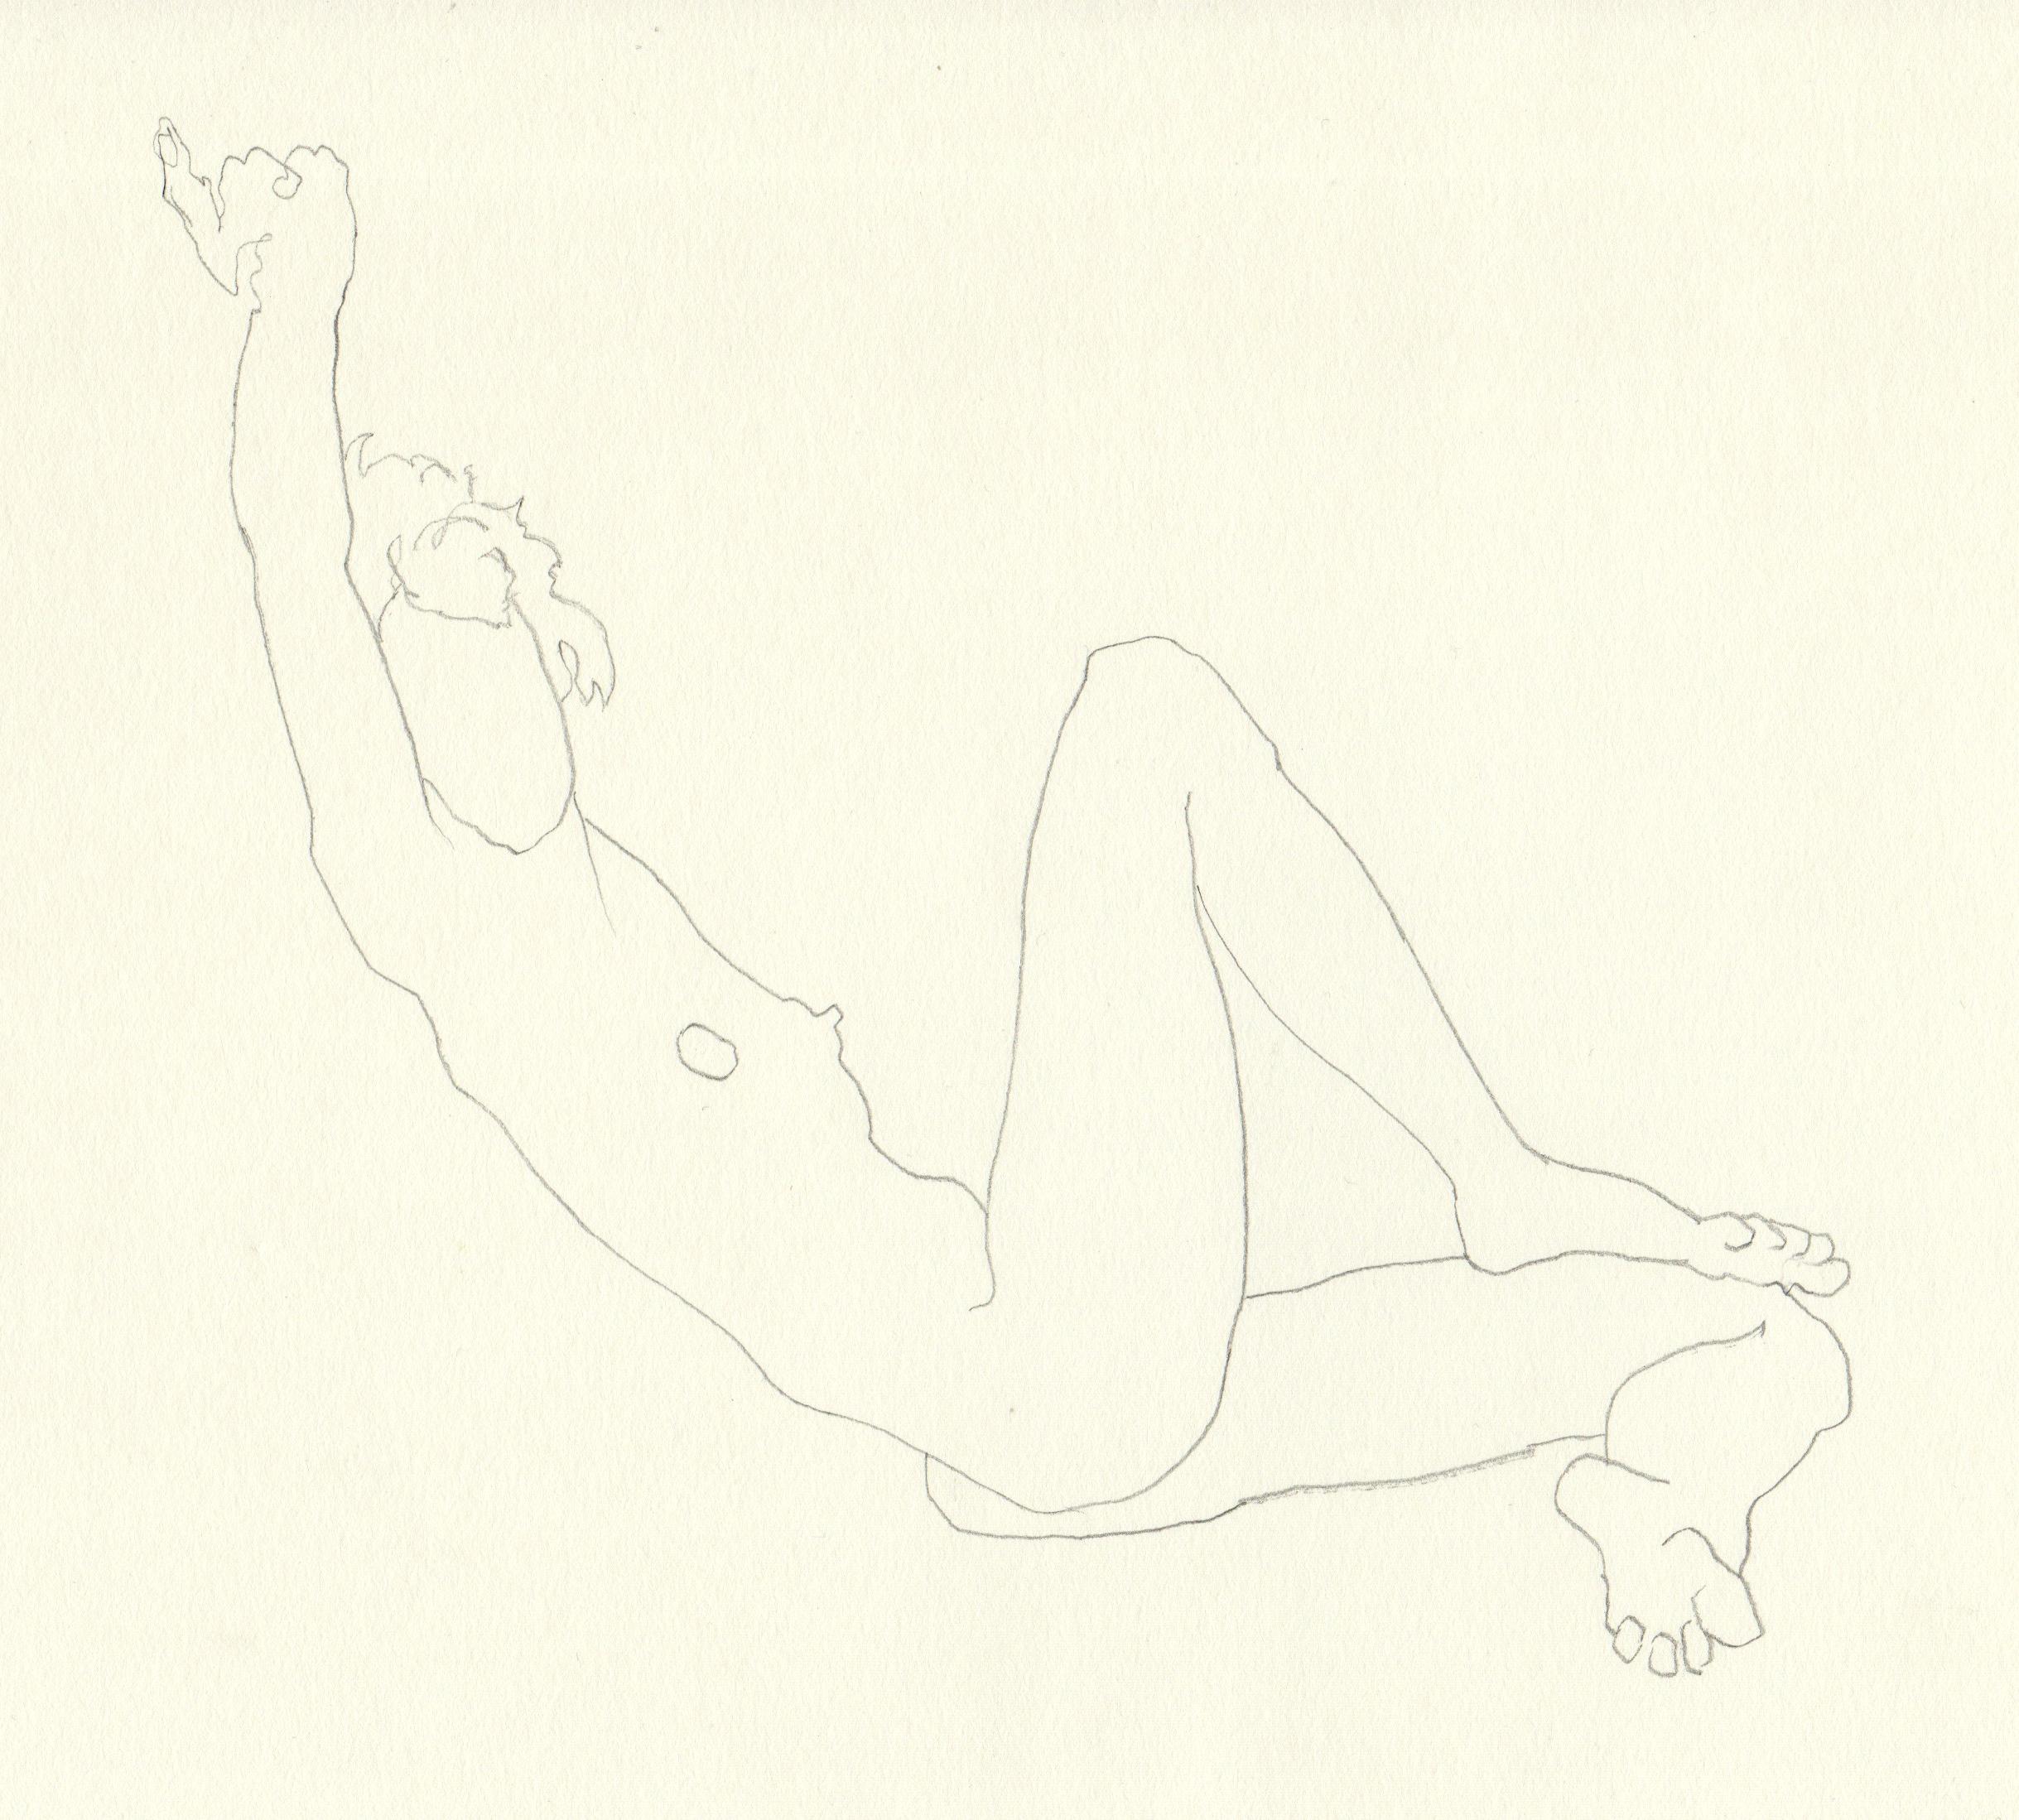 2012_Sketch_F-Beudin_069